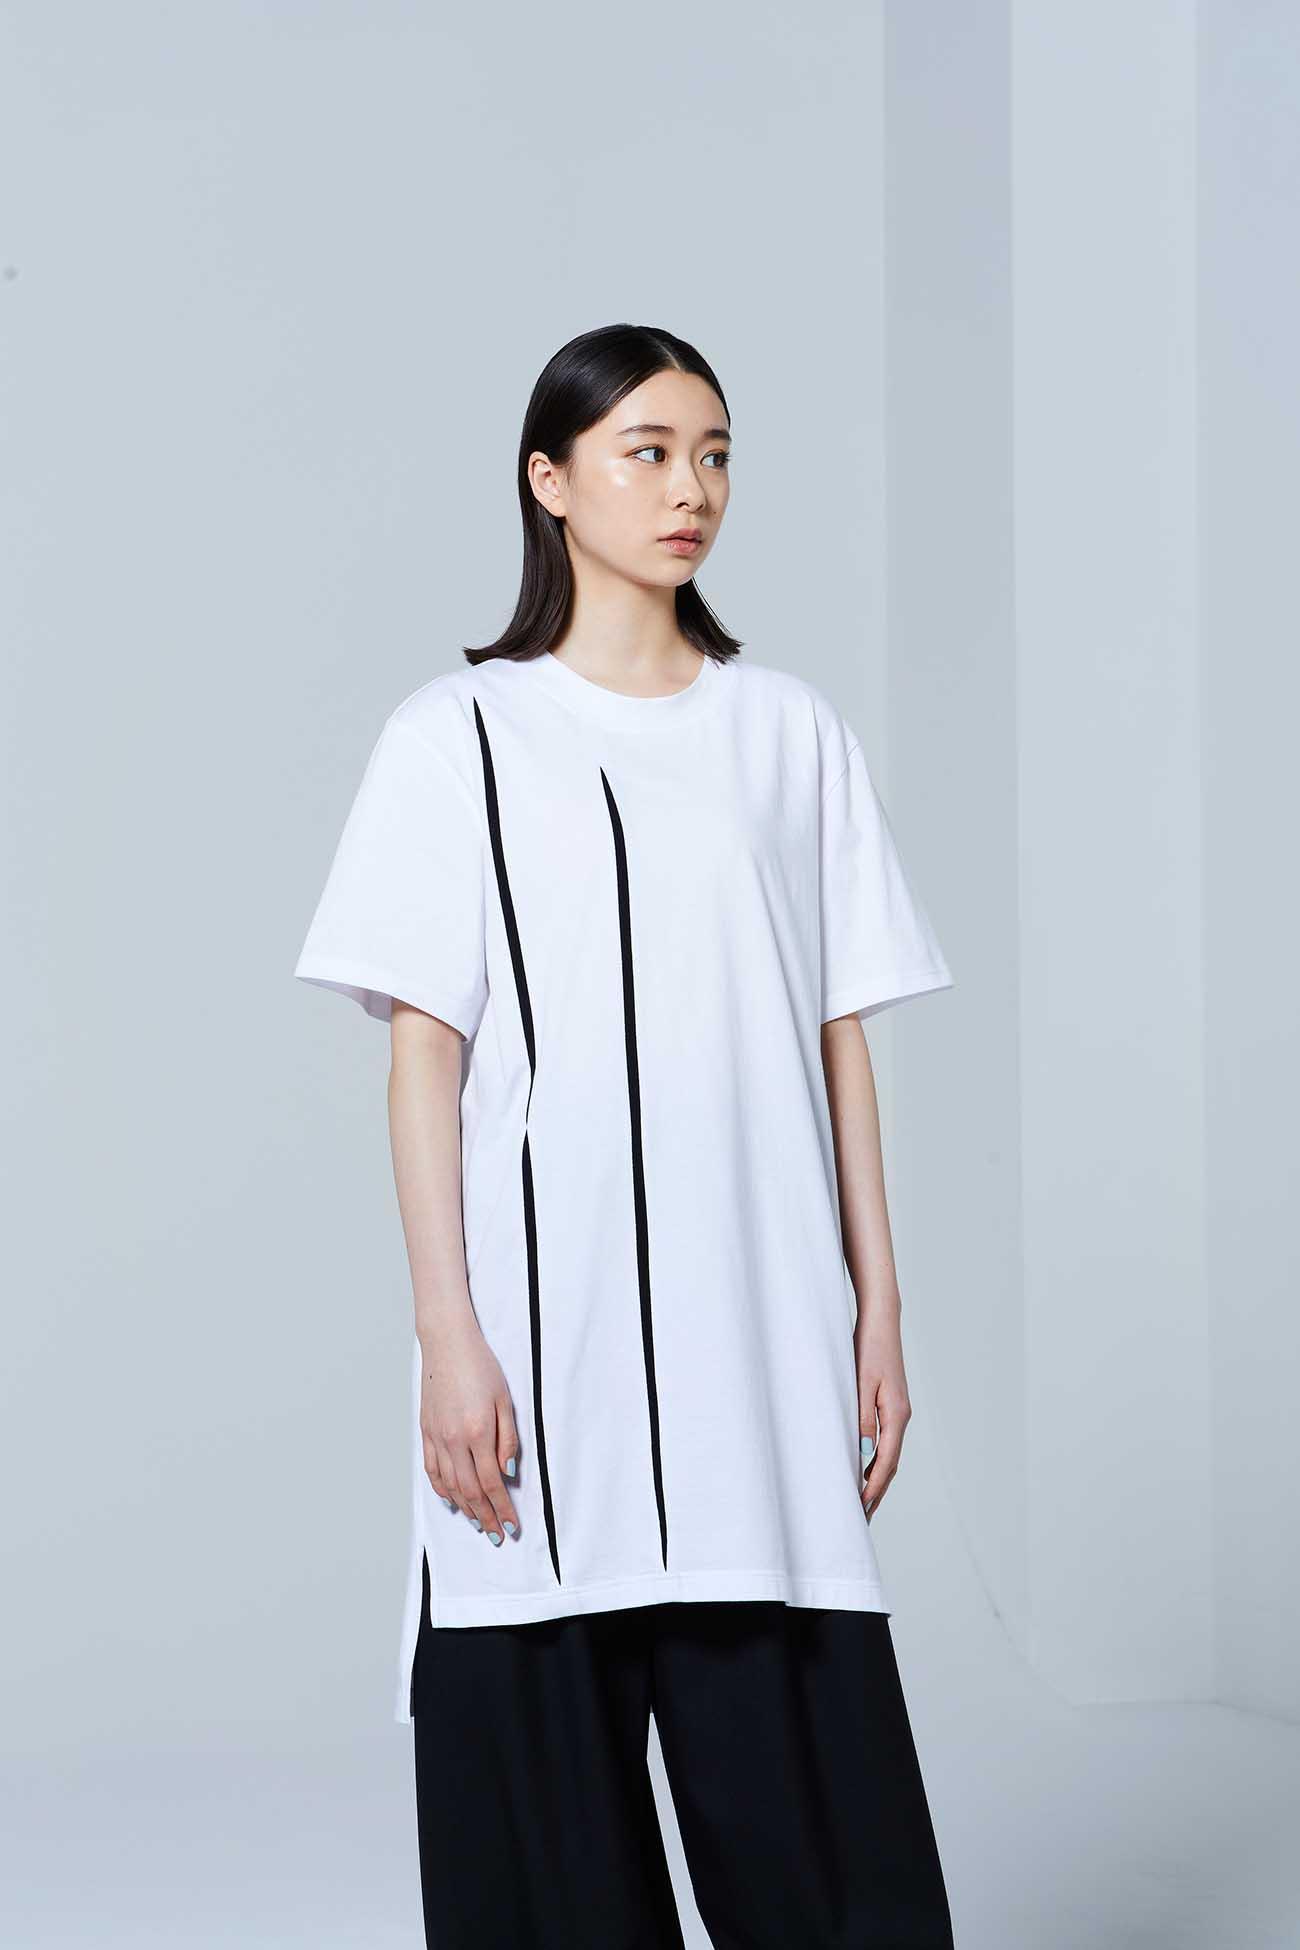 30/Cotton Jersey Cutting Blade Short Sleeves Cut Sew